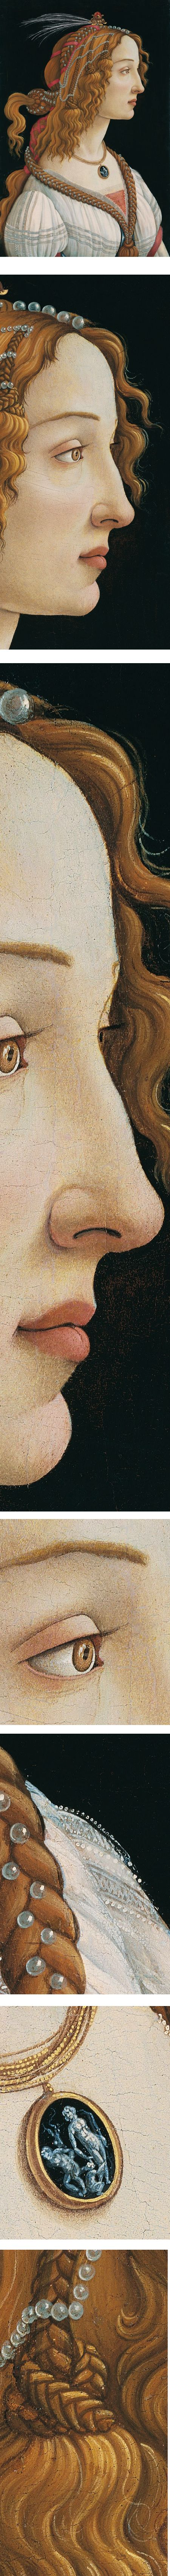 Idealized Portrait of a Lady (Portrait of Simonetta Vespucci as Nymph), Sandro Botticelli